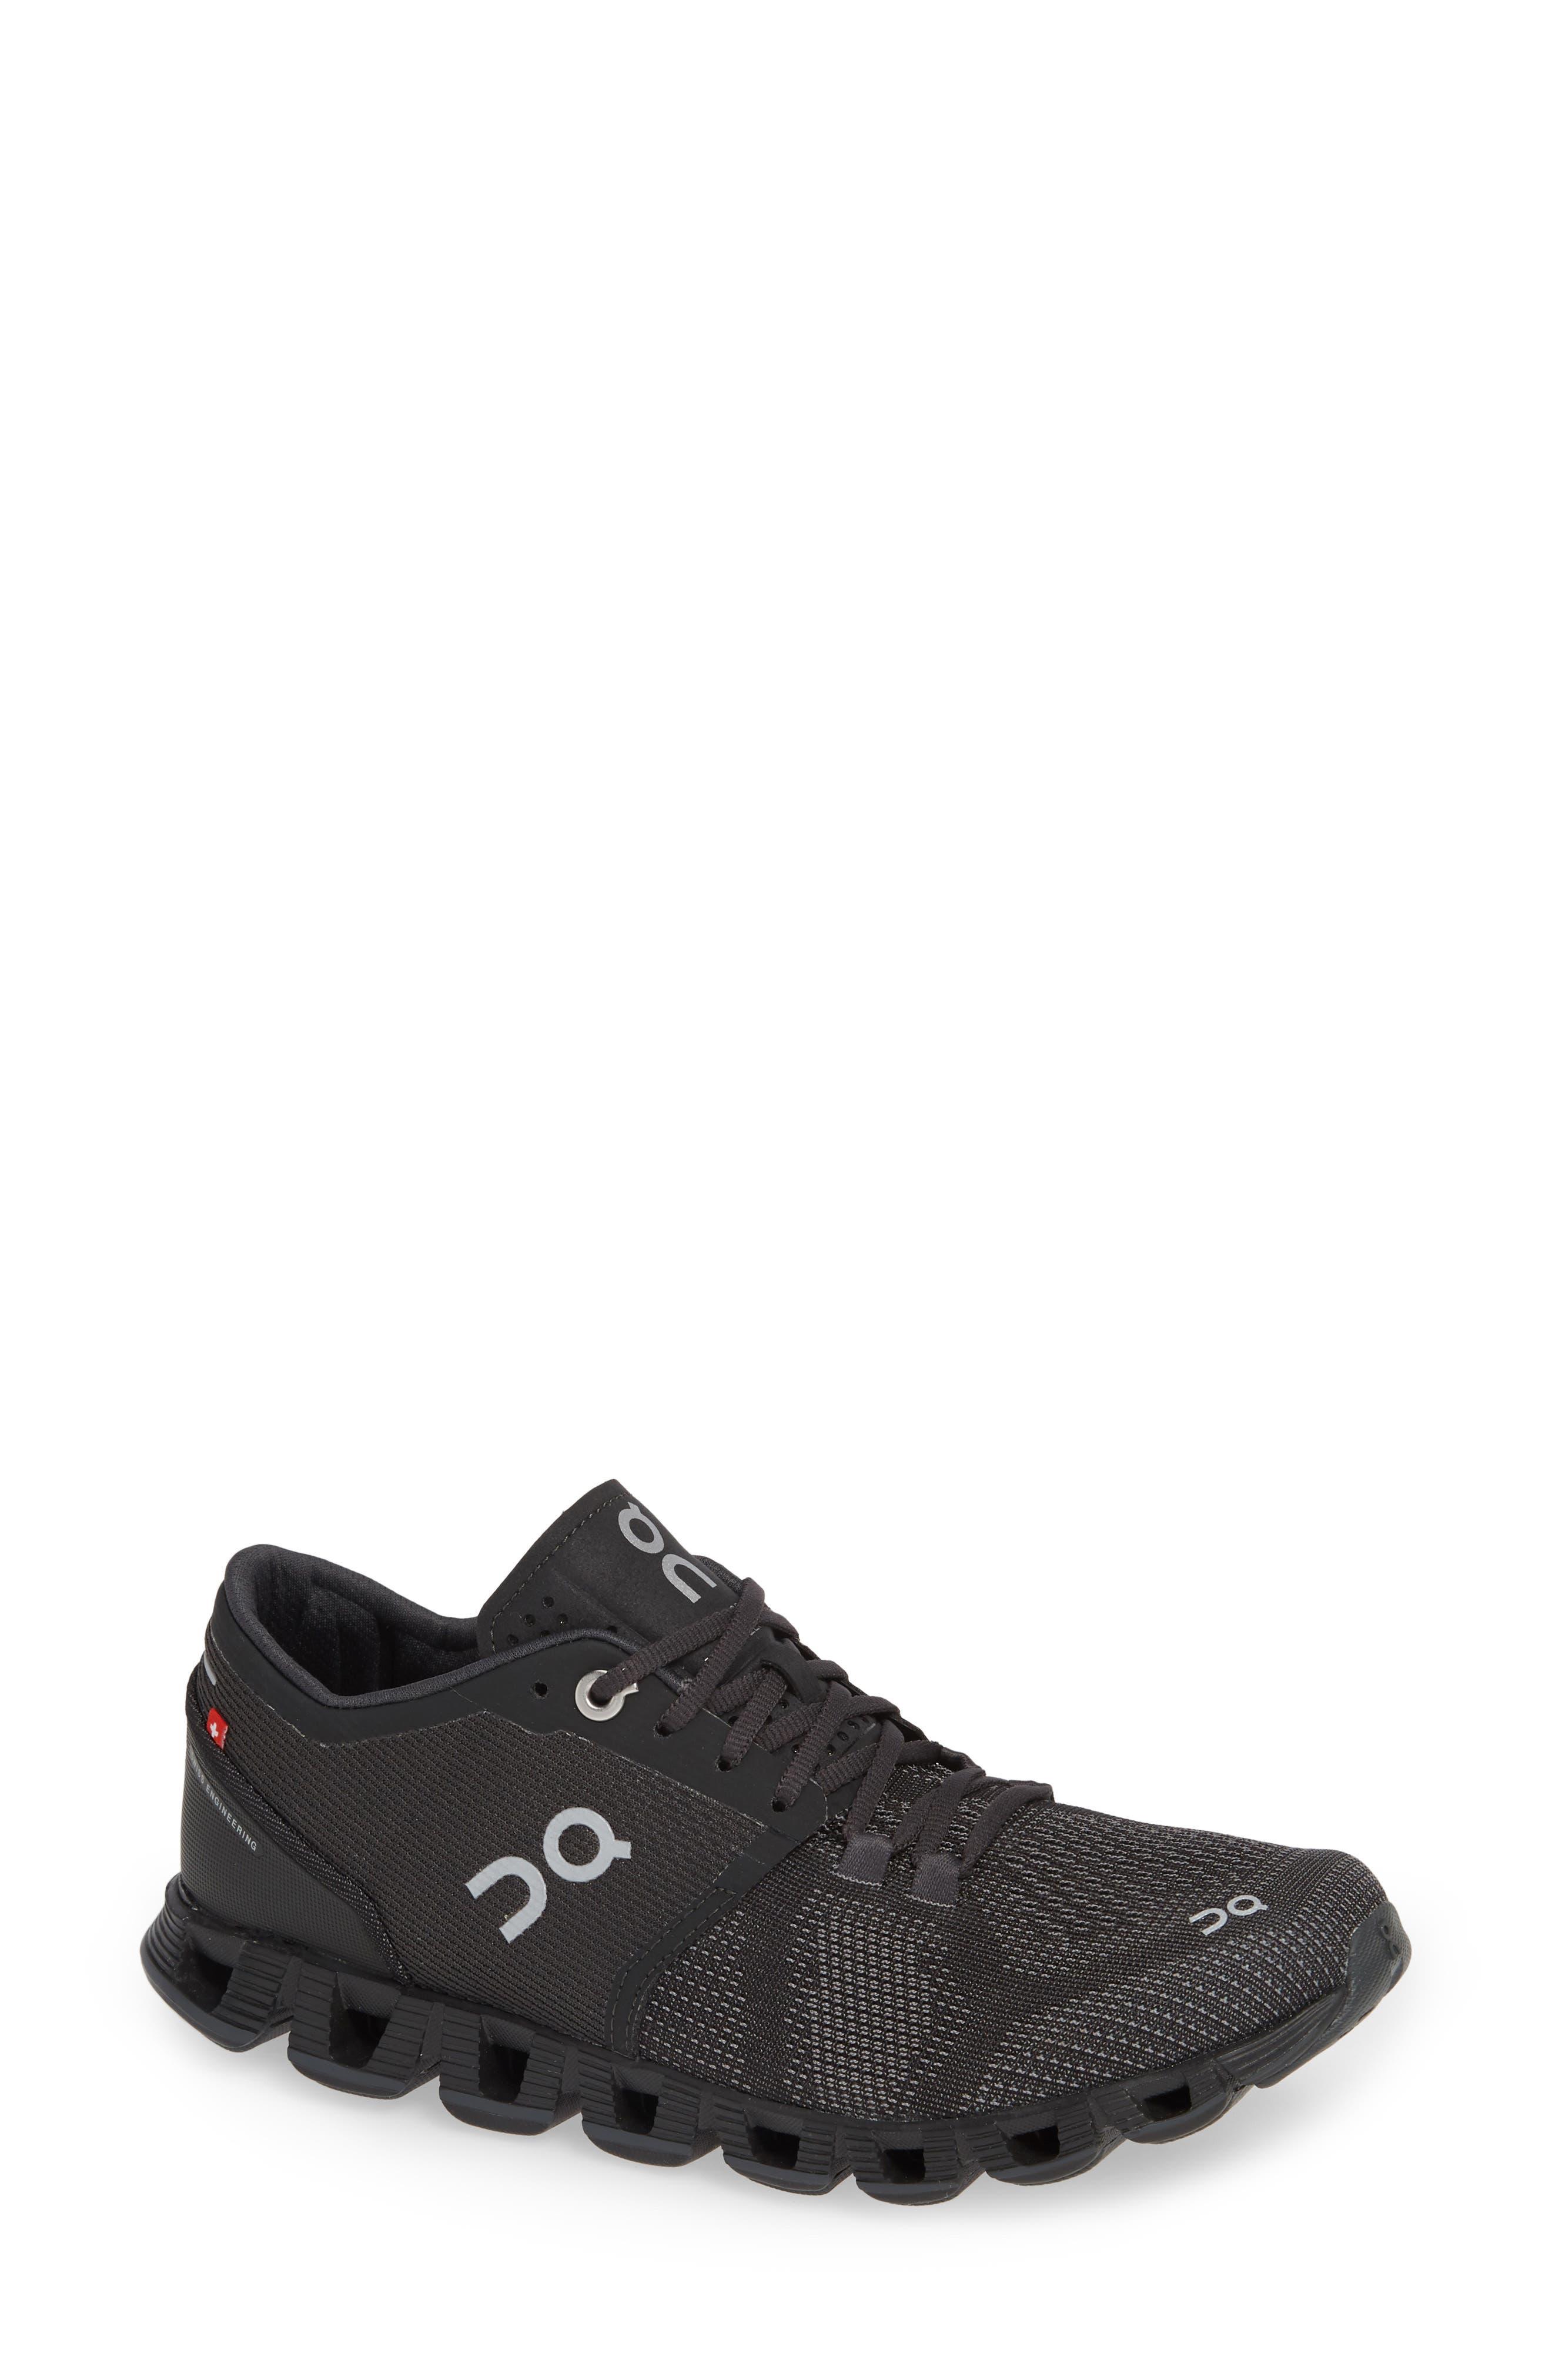 Cloud X Running Shoe, Main, color, BLACK/ ASPHALT